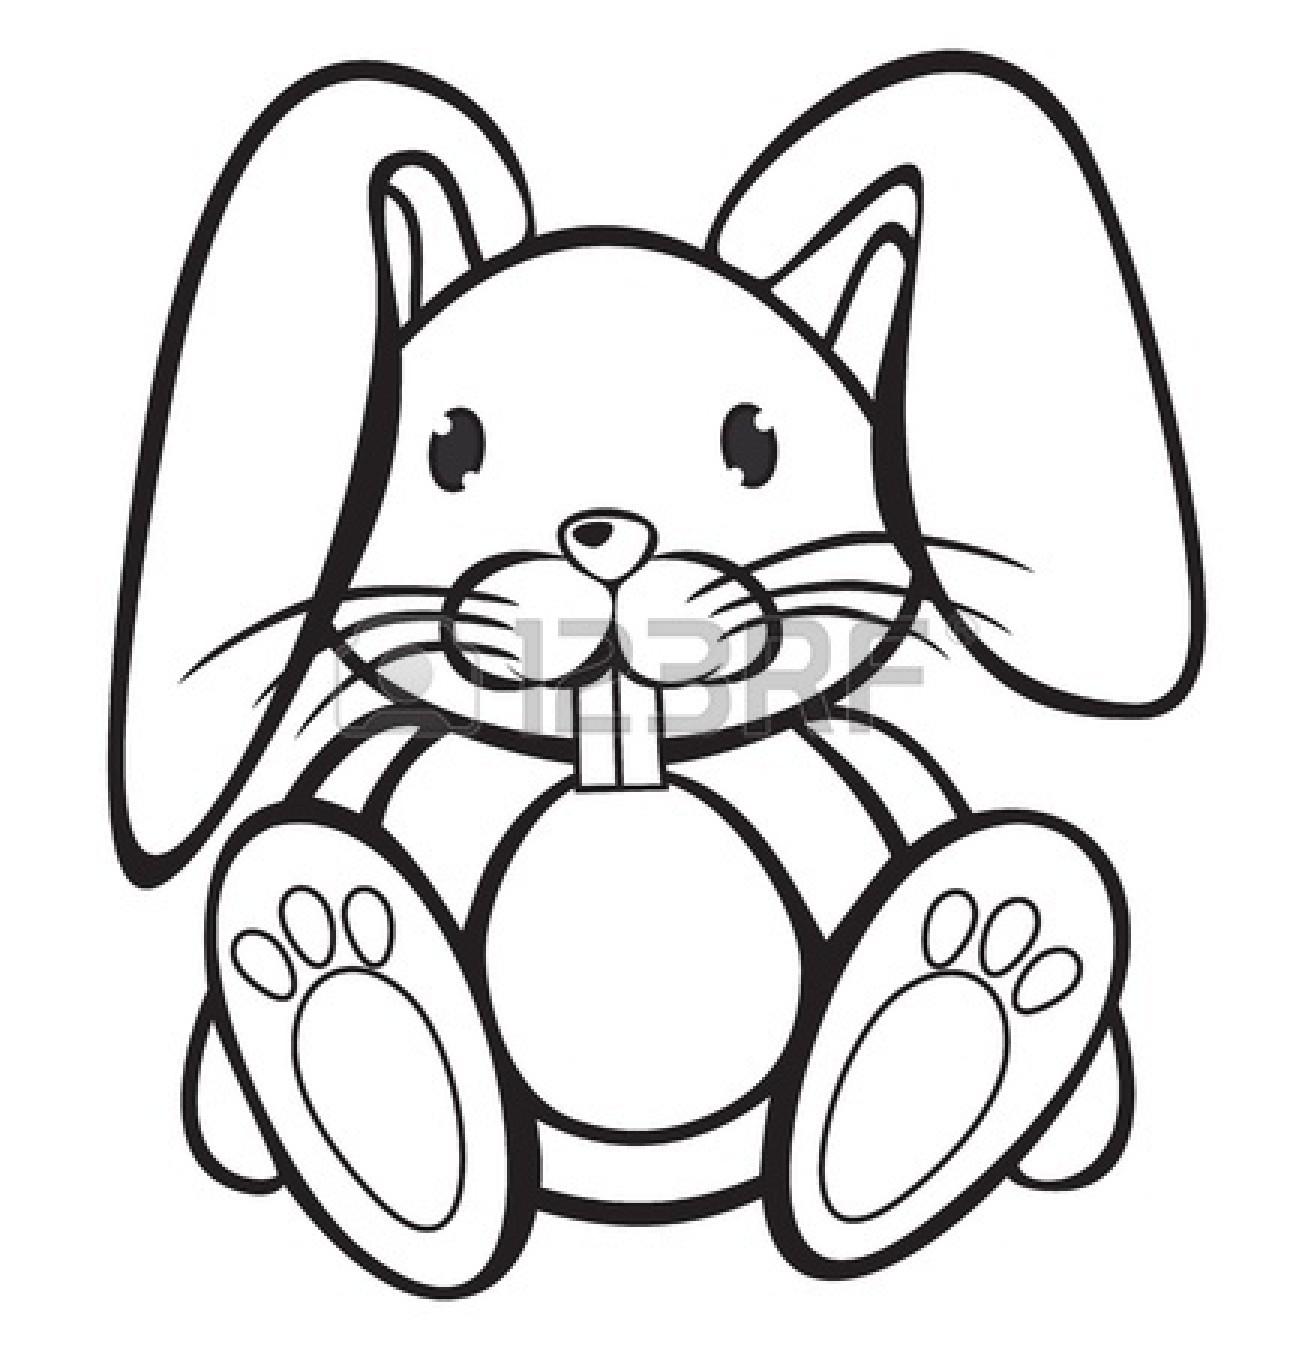 Rabbit Black And White Clipart